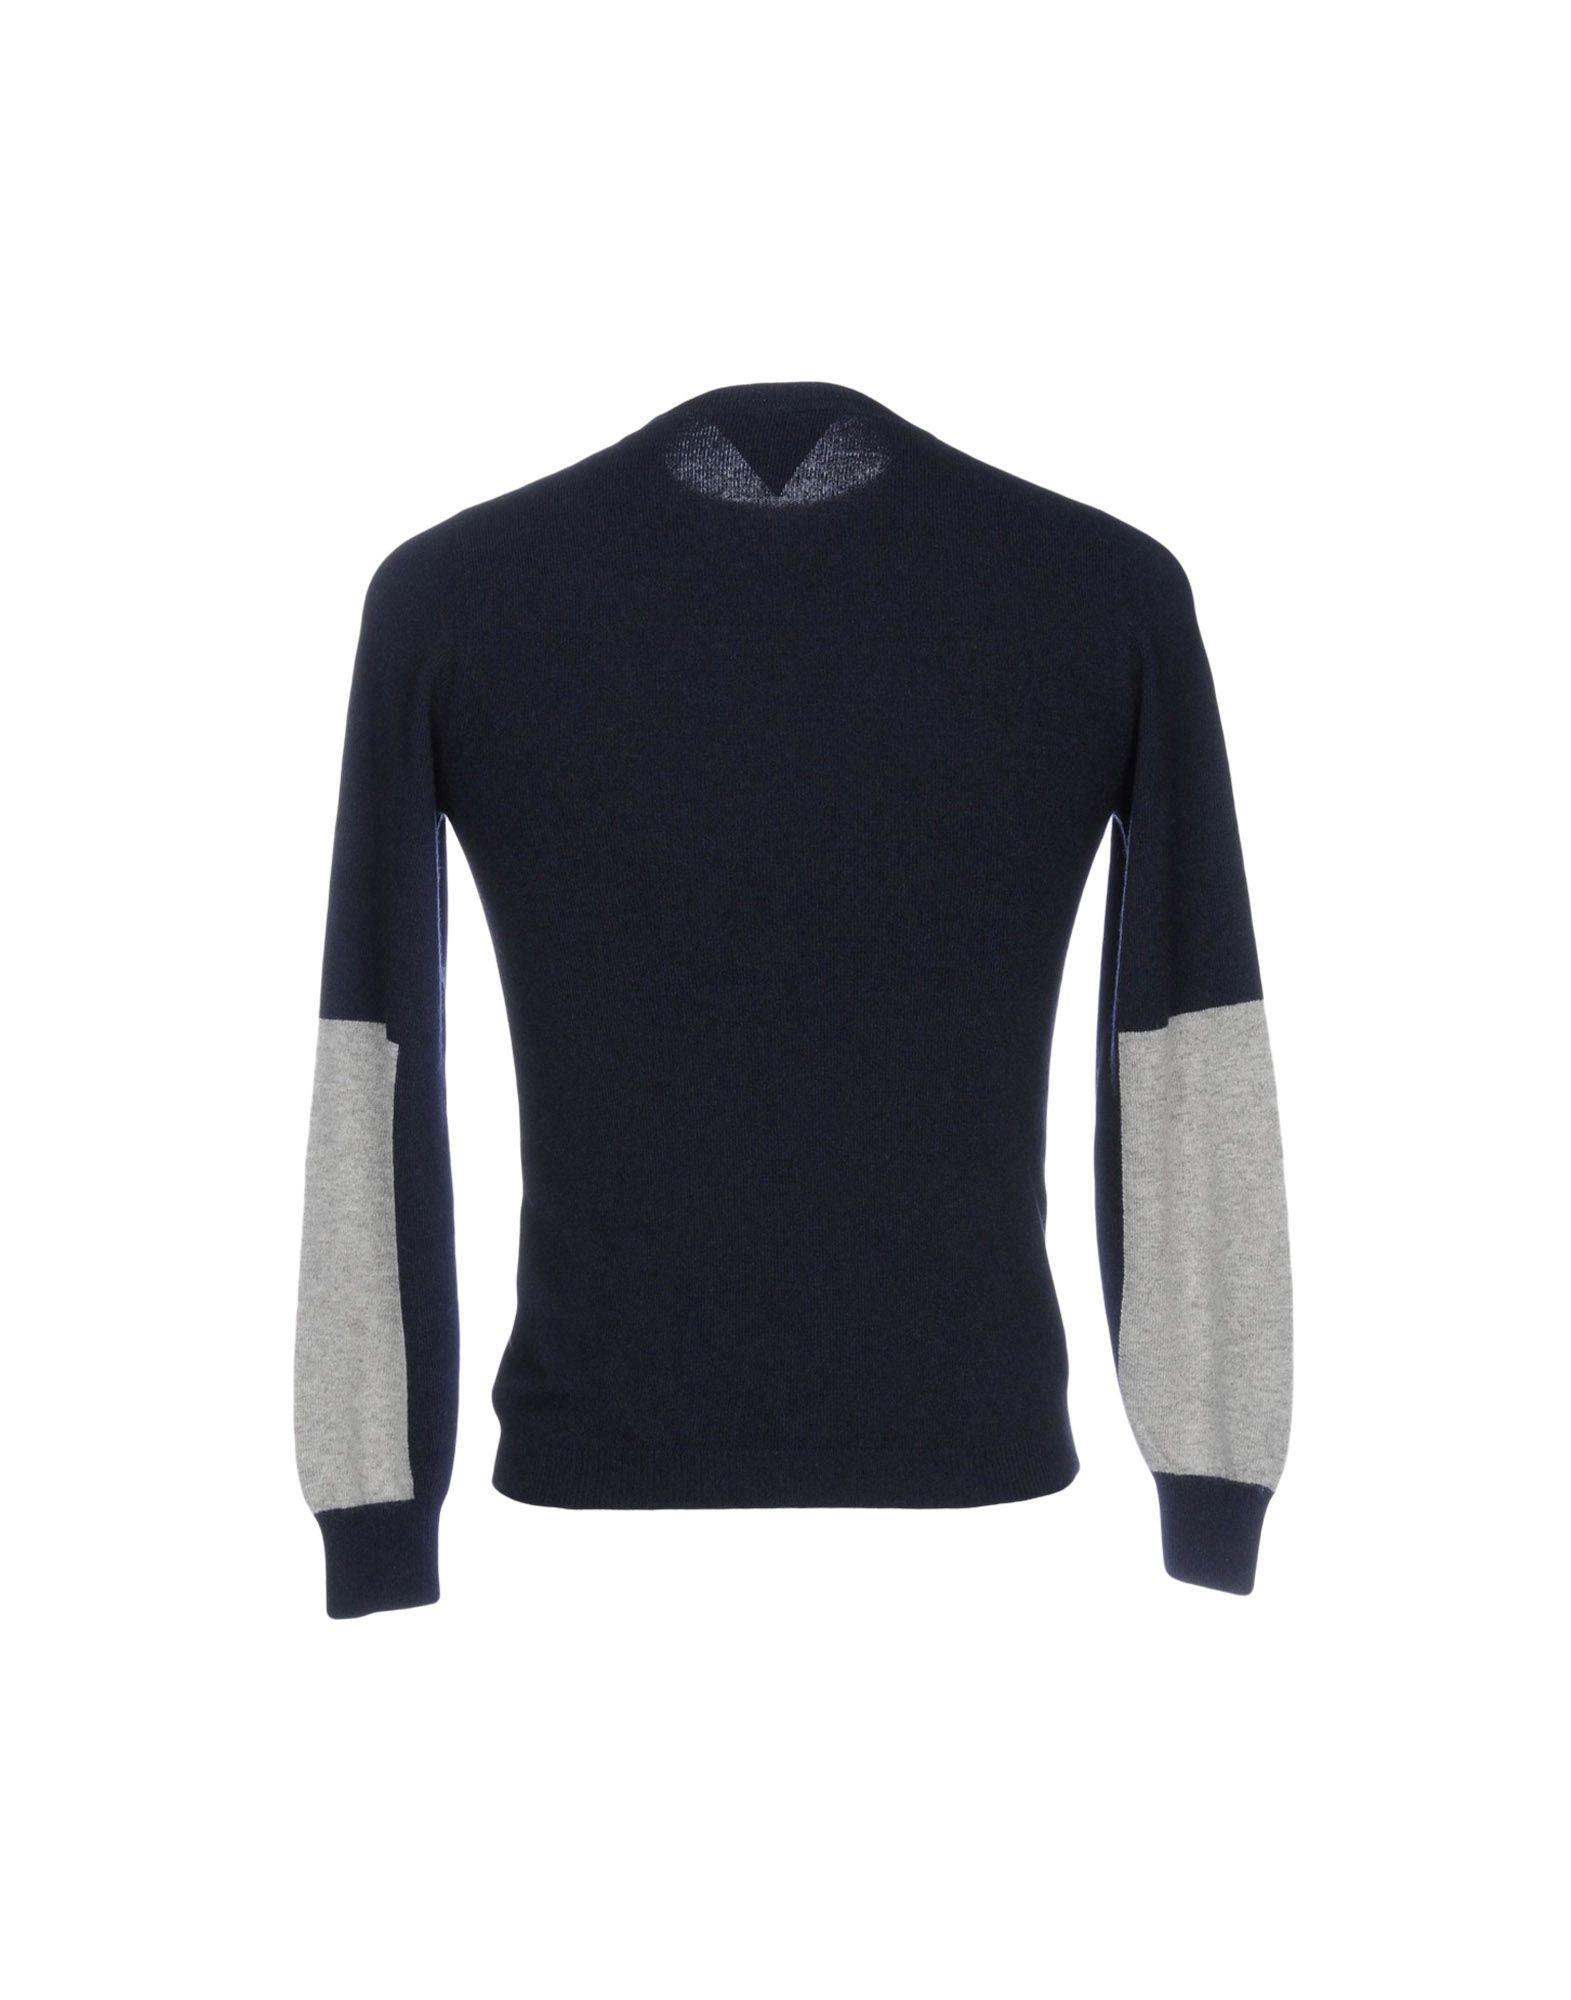 92802859f6b J For Lyst Sweater Macchia Blue In Men 8Fqfz